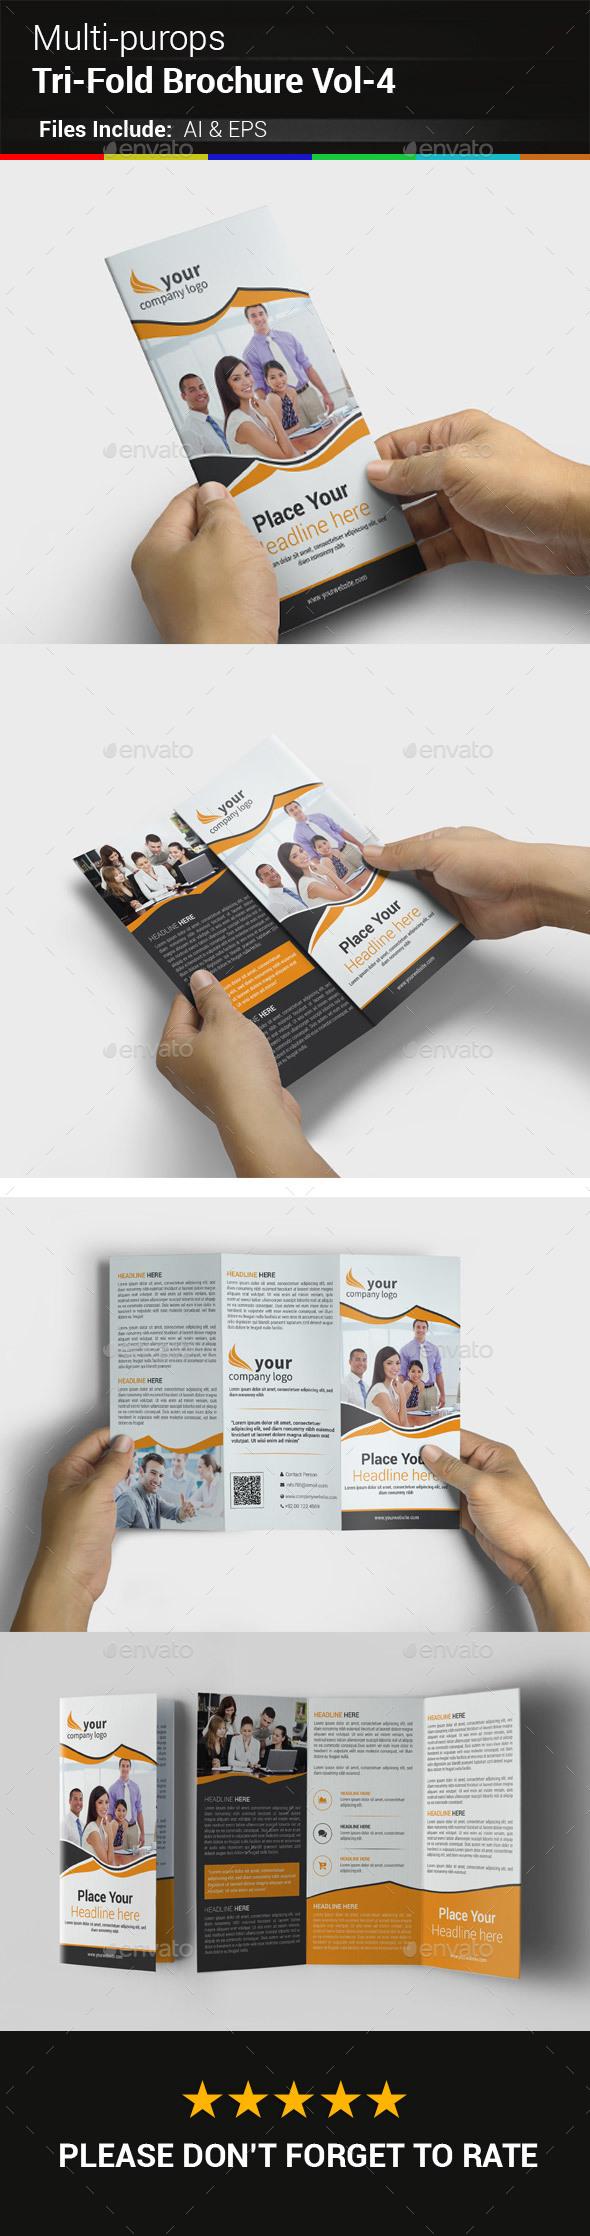 Multipurpose Business Tri-Fold Brochure Vol-4 - Corporate Brochures